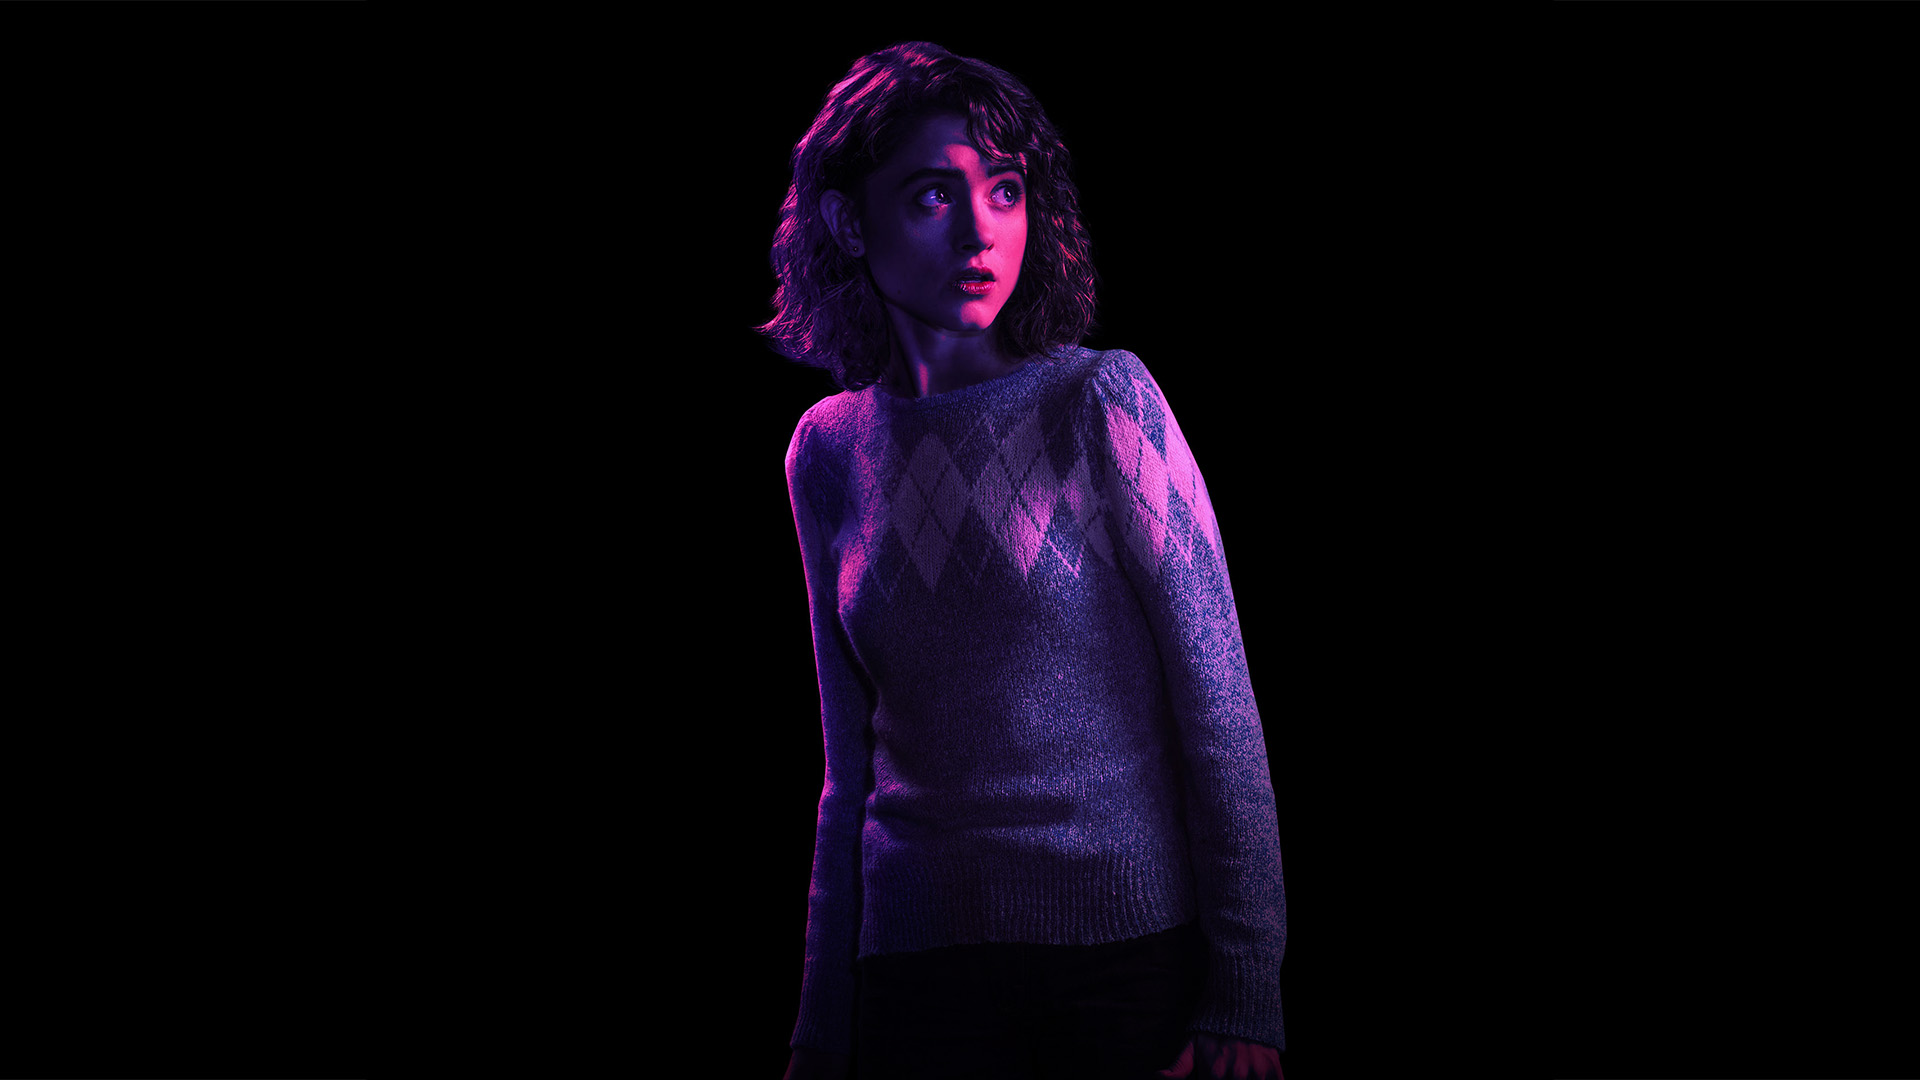 Natalia Dyer As Nancy Stranger Things Season 2 Hd Tv Shows 4k